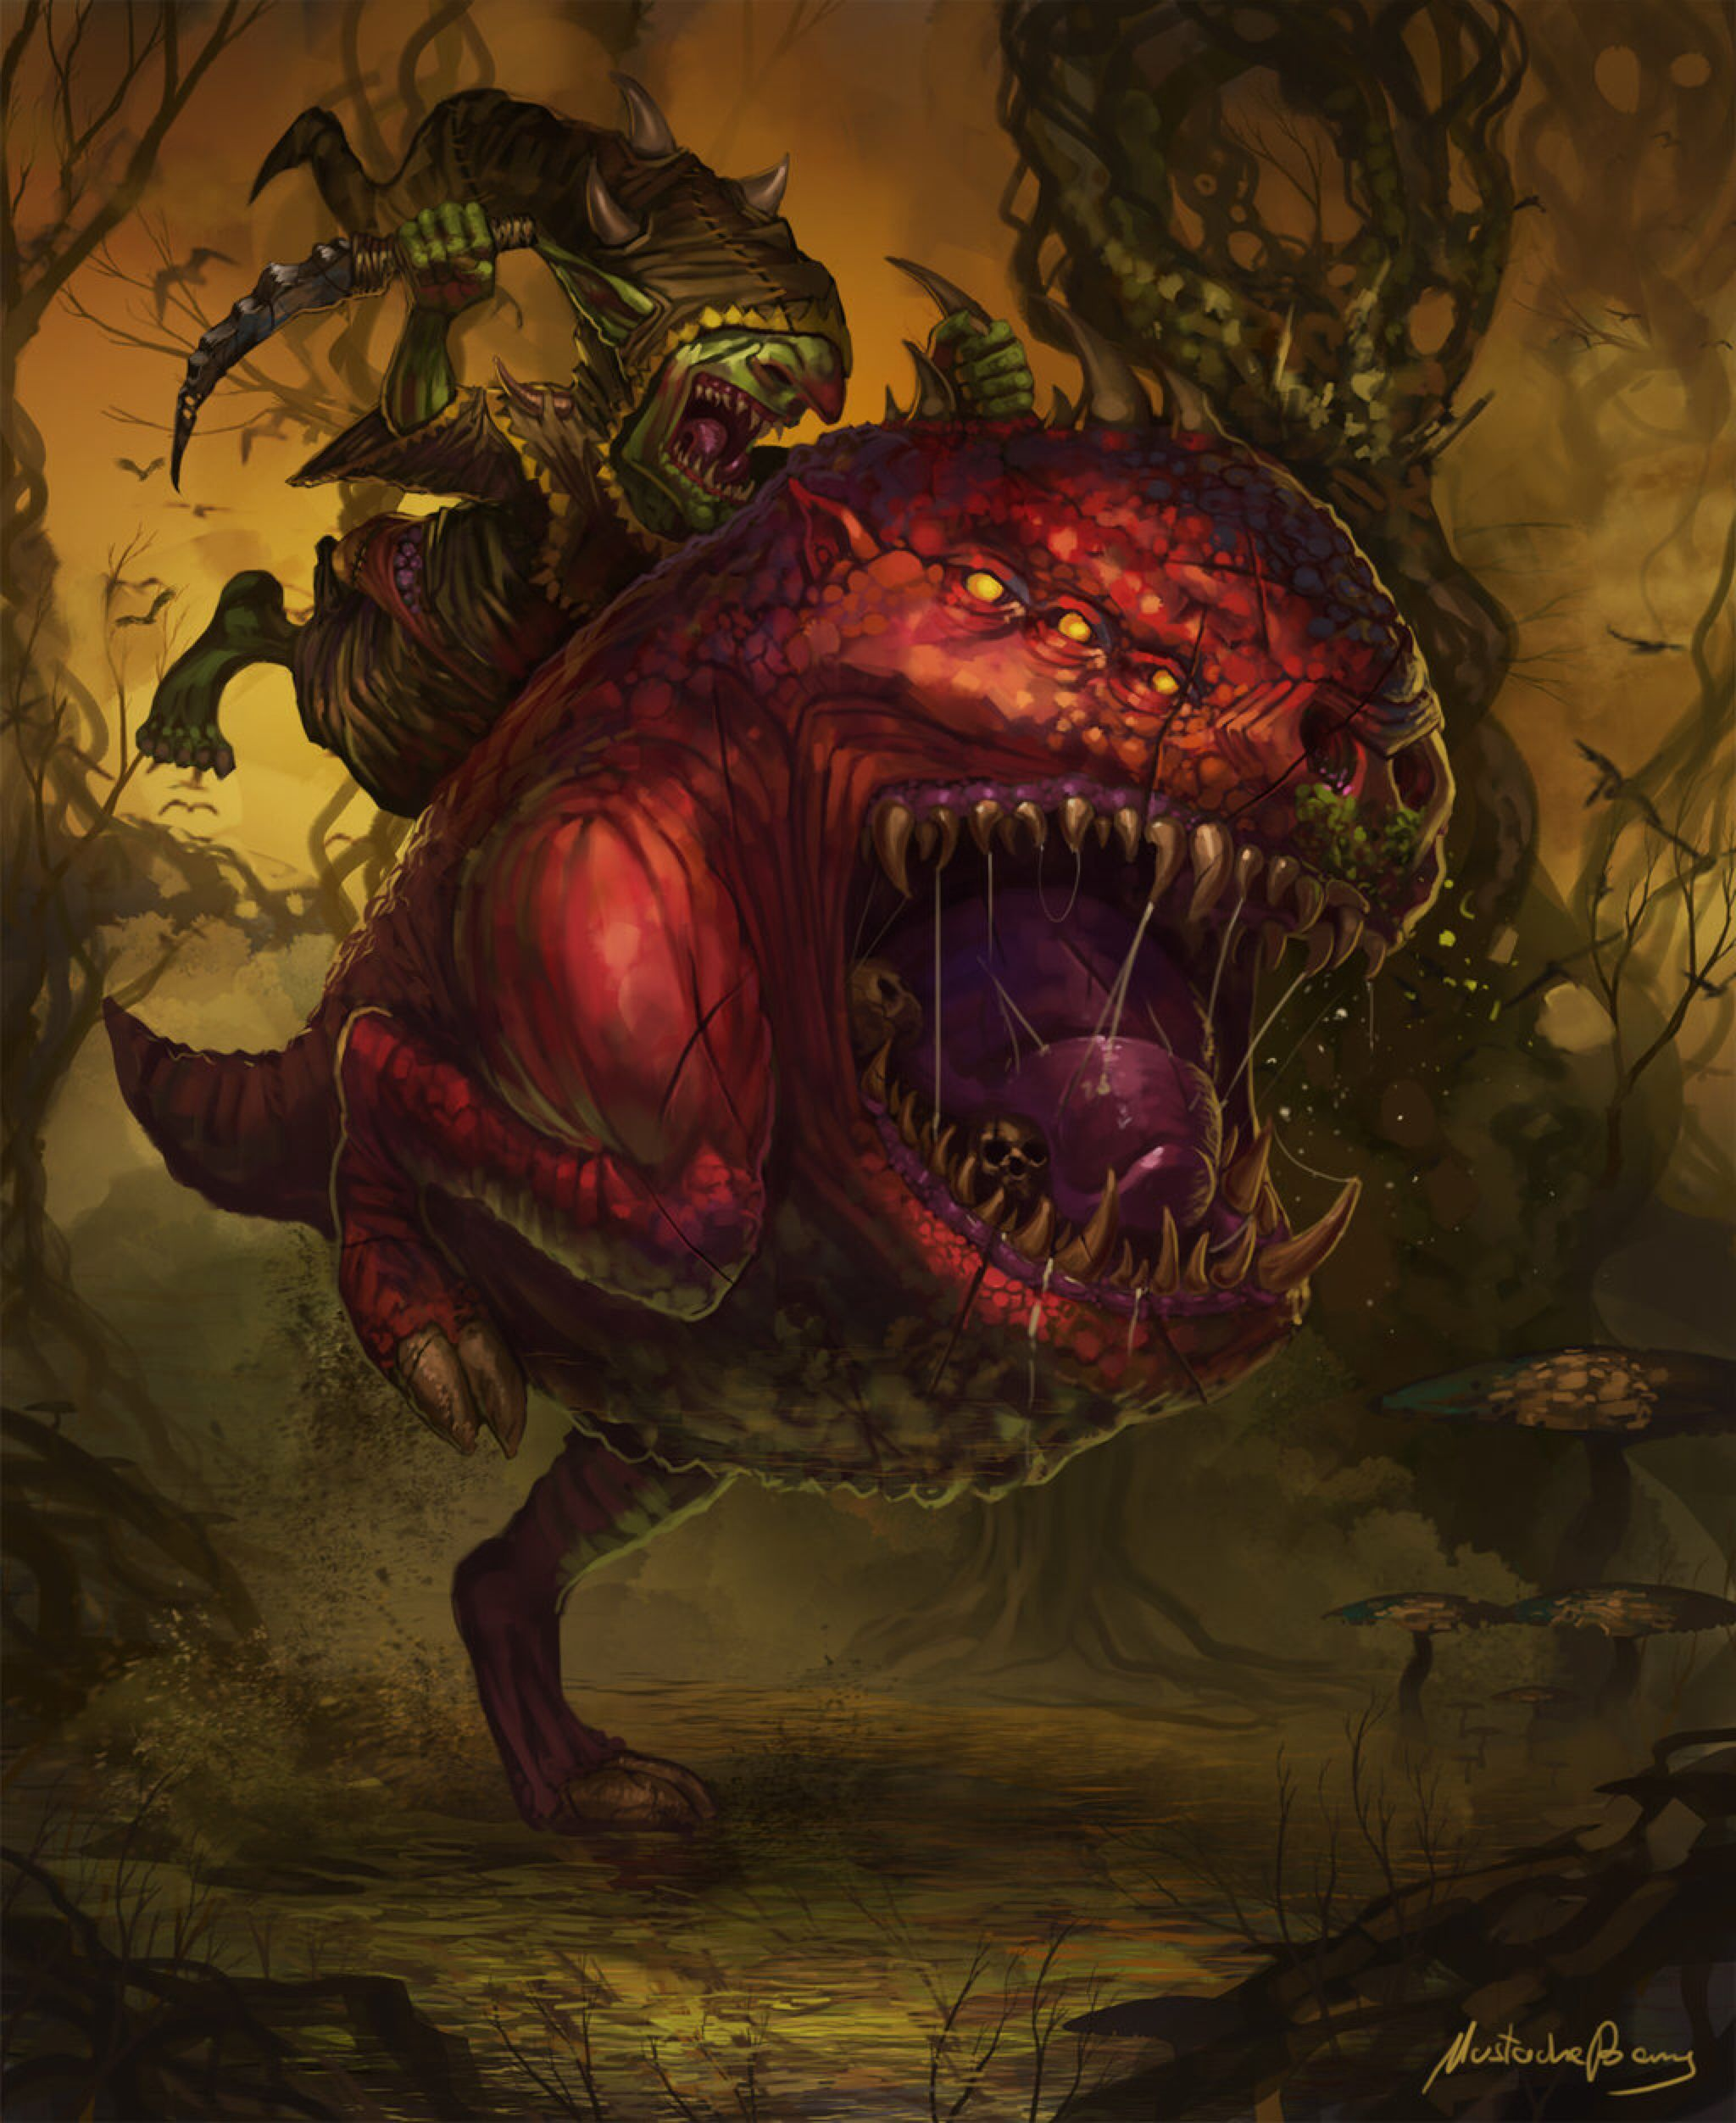 Warhammer Fantasy Age of Sigmar Gloomspite Gitz Night Goblins Squig Hoppers